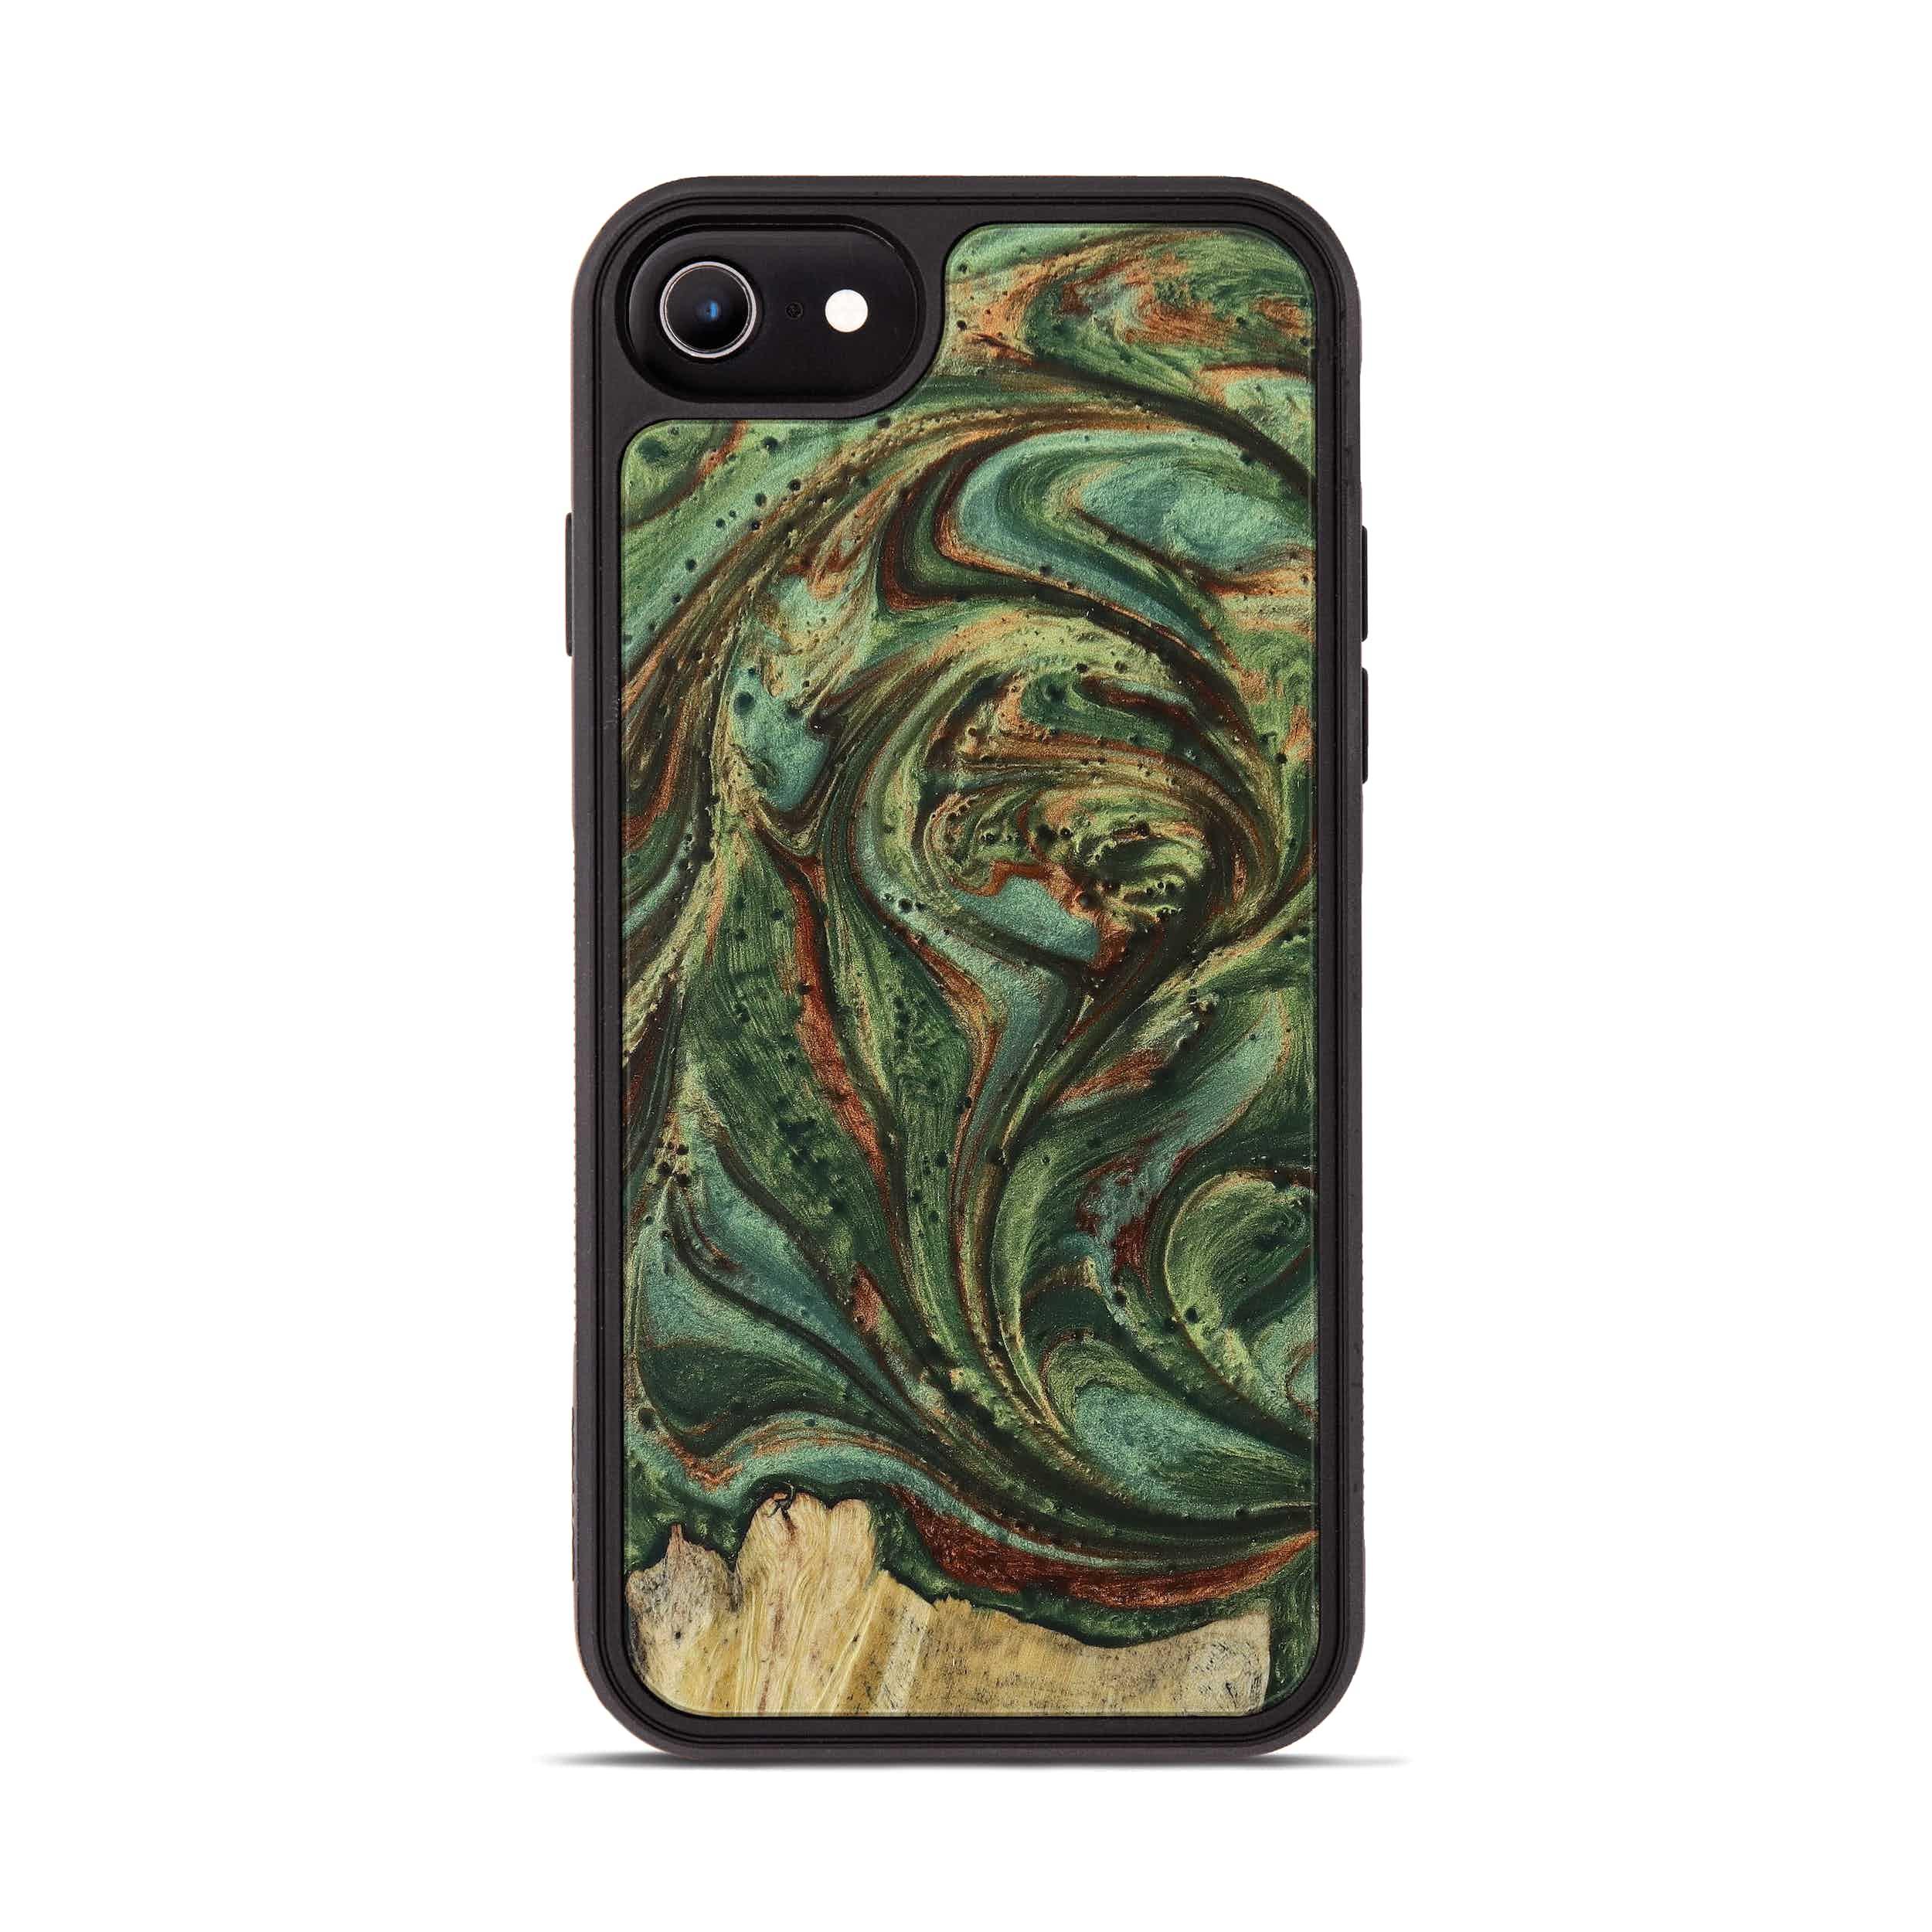 iPhone 6s Wood+Resin Phone Case - Bernadene (Dark Green, 395221)